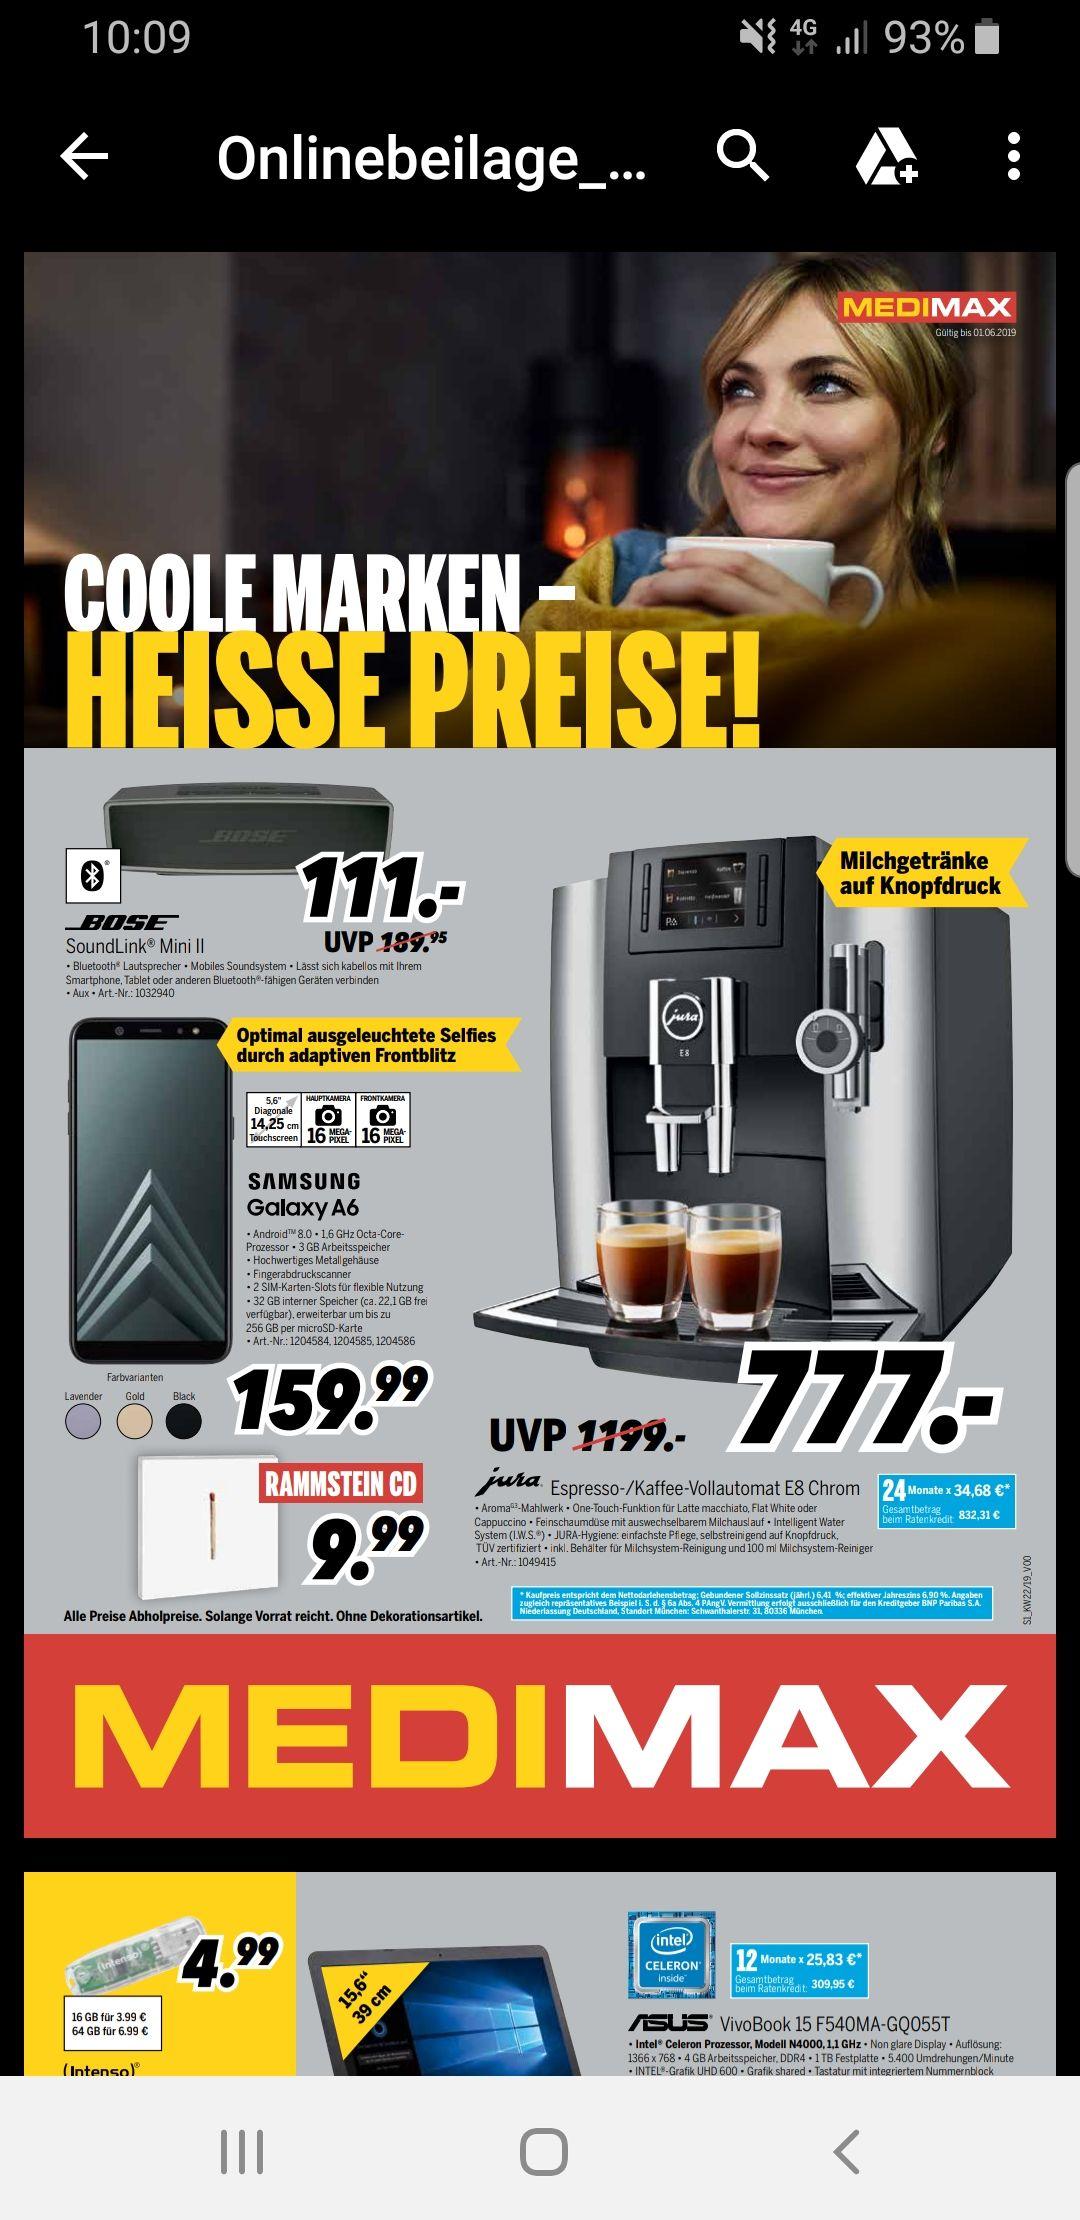 Jura E8 Kaffeevollautomat für 777€ bei MEDIMAX